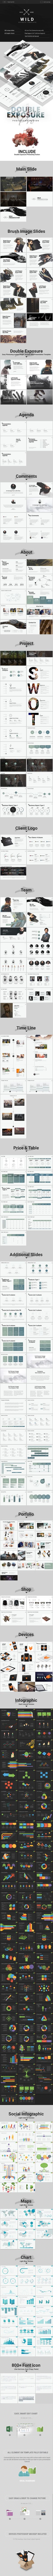 WILD - Keynote Template #design #slides Download: http://graphicriver.net/item/wild-keynote-template/13731146?ref=ksioks